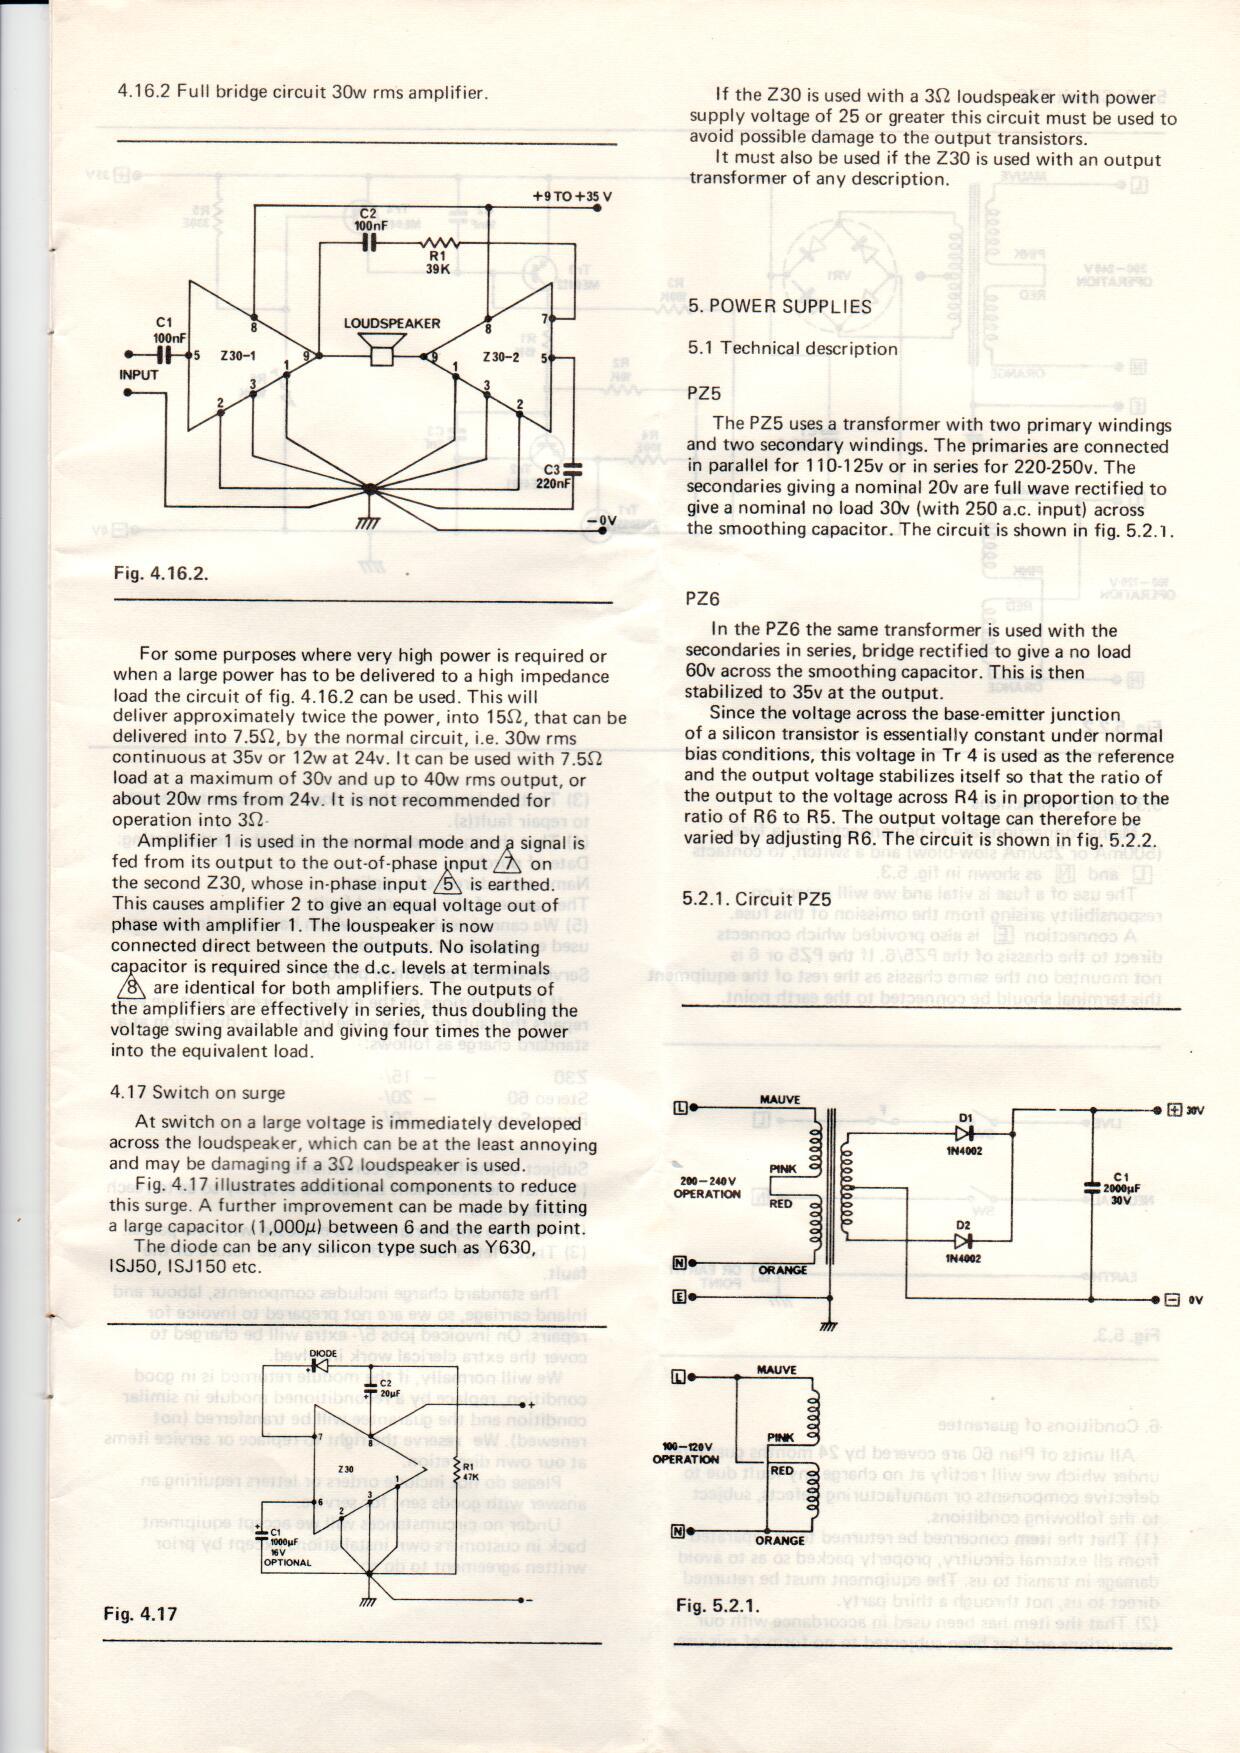 Sinclair Radionics Project 60 Manual Contents Amplifier Circuit Diagram Projects 521 Pz5